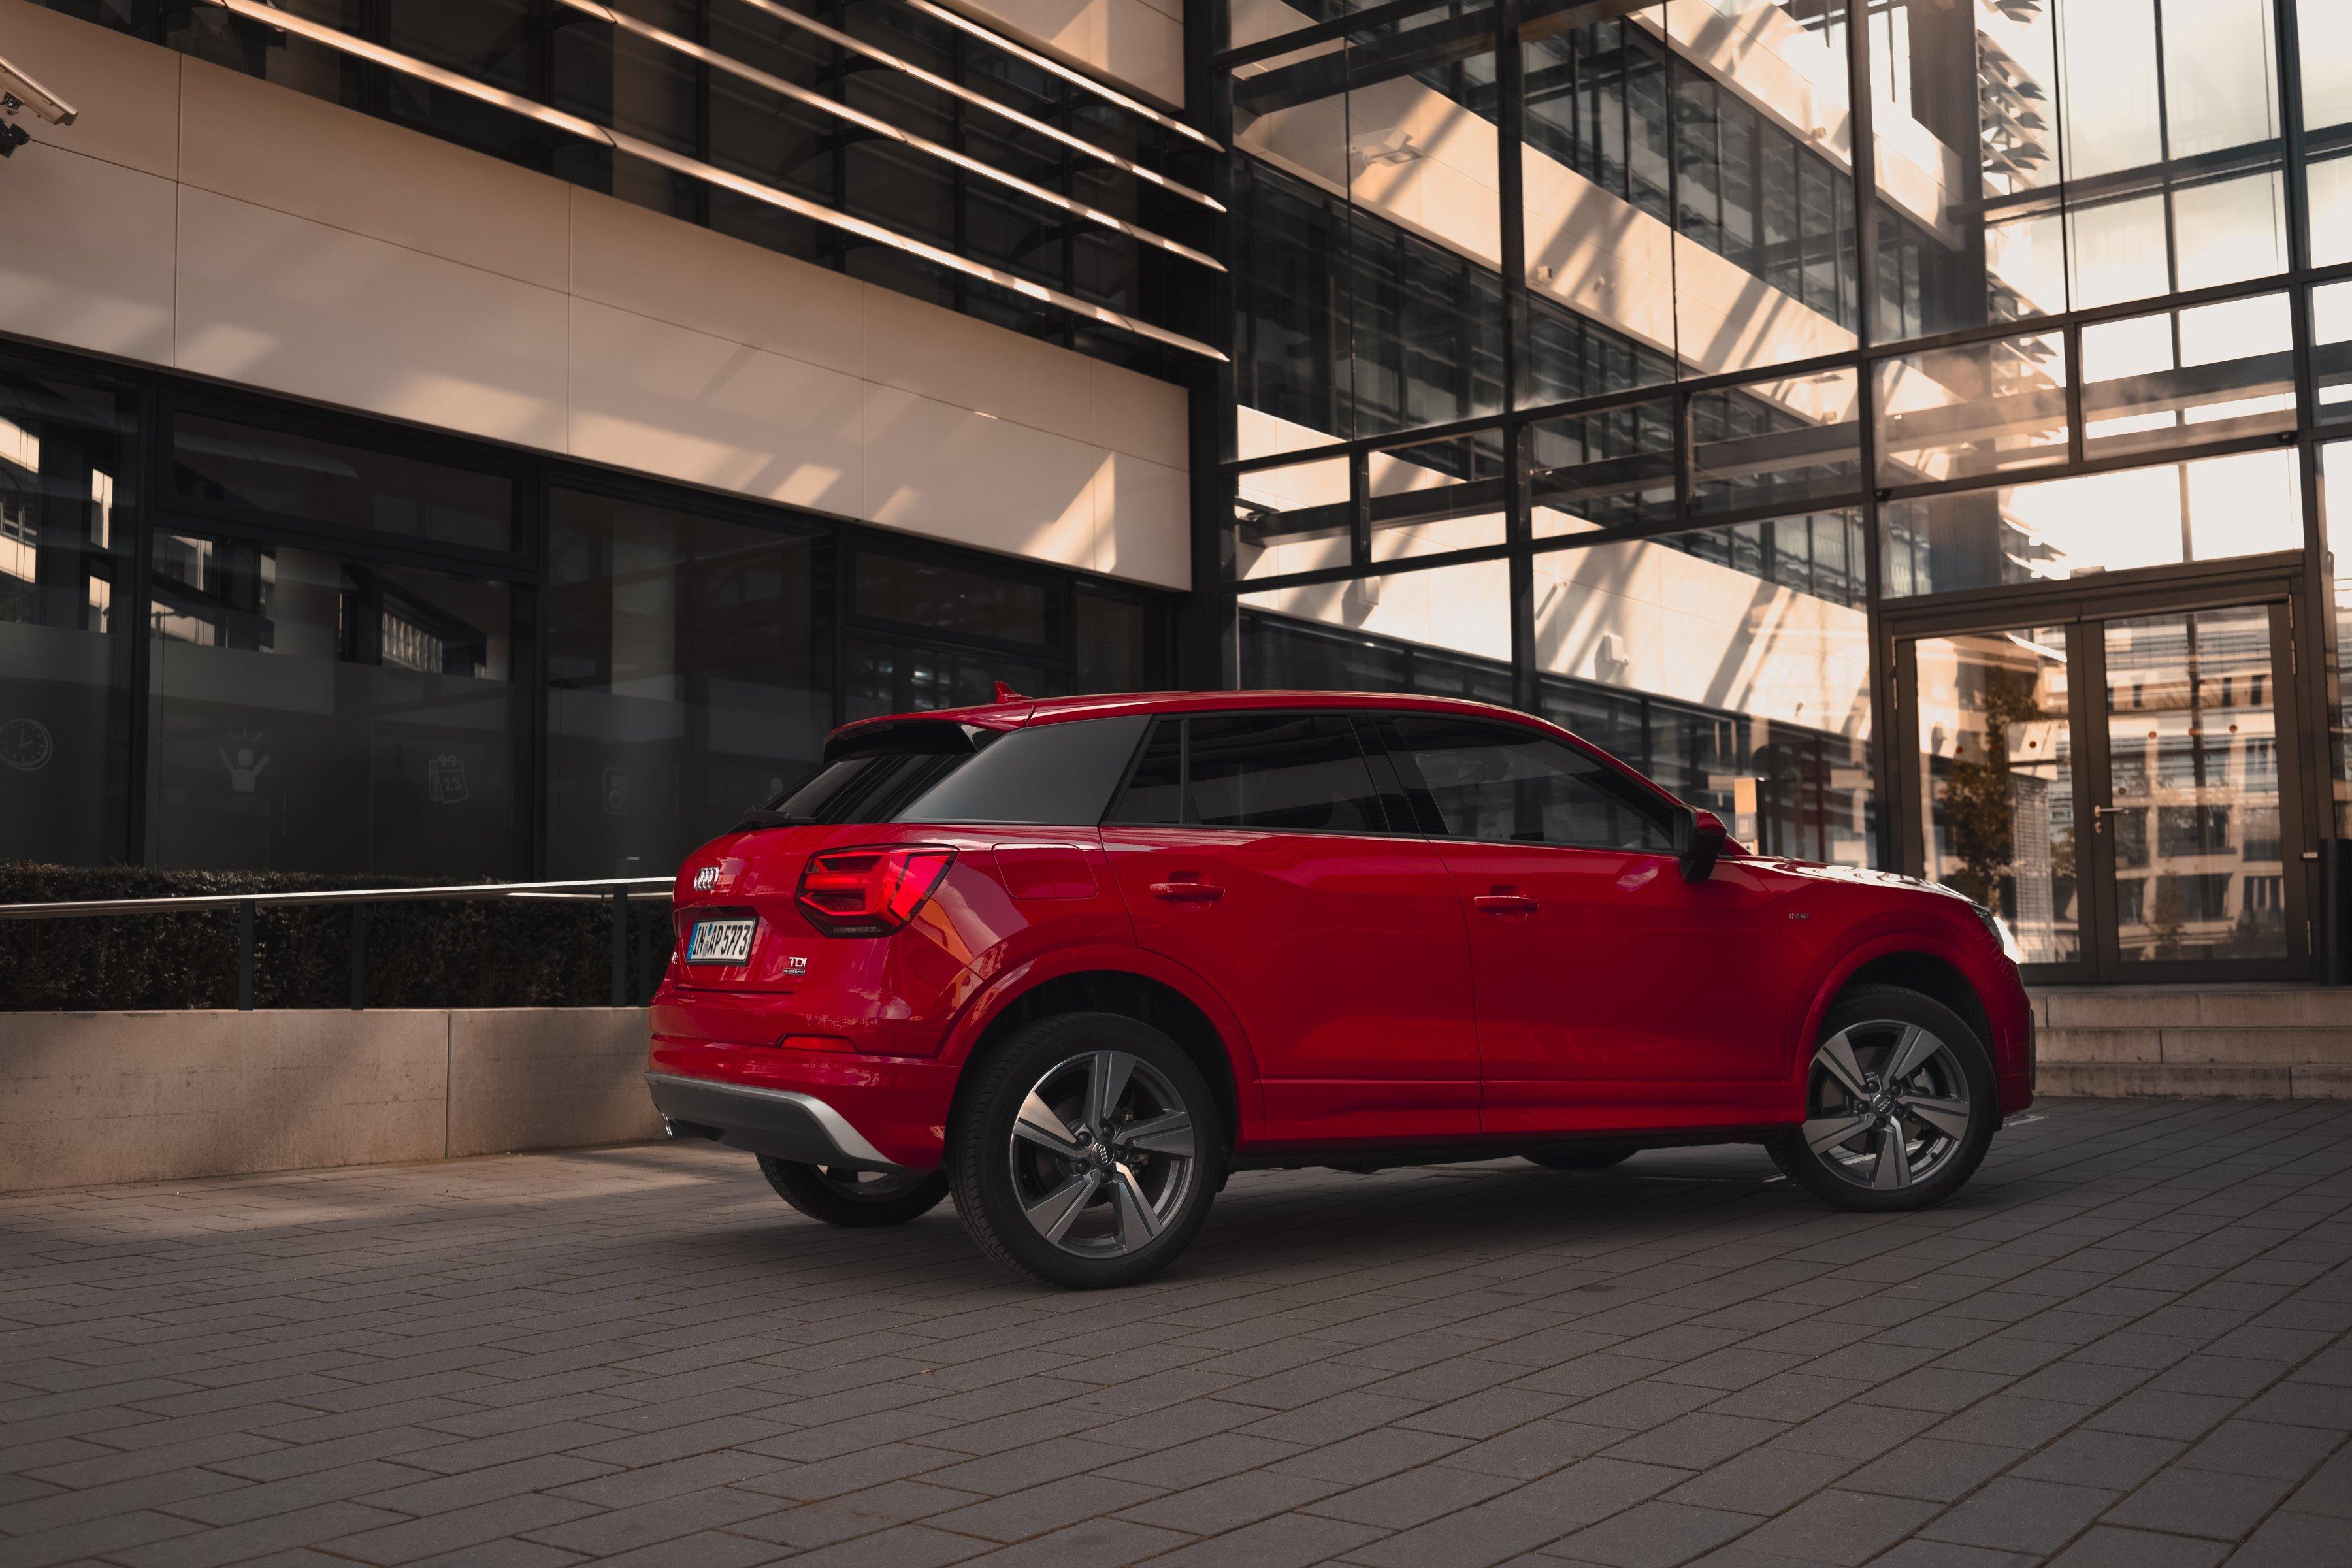 Audi Q2 Customizing Sport Sline rot Sonnenuntergang moderne Gebäudefront